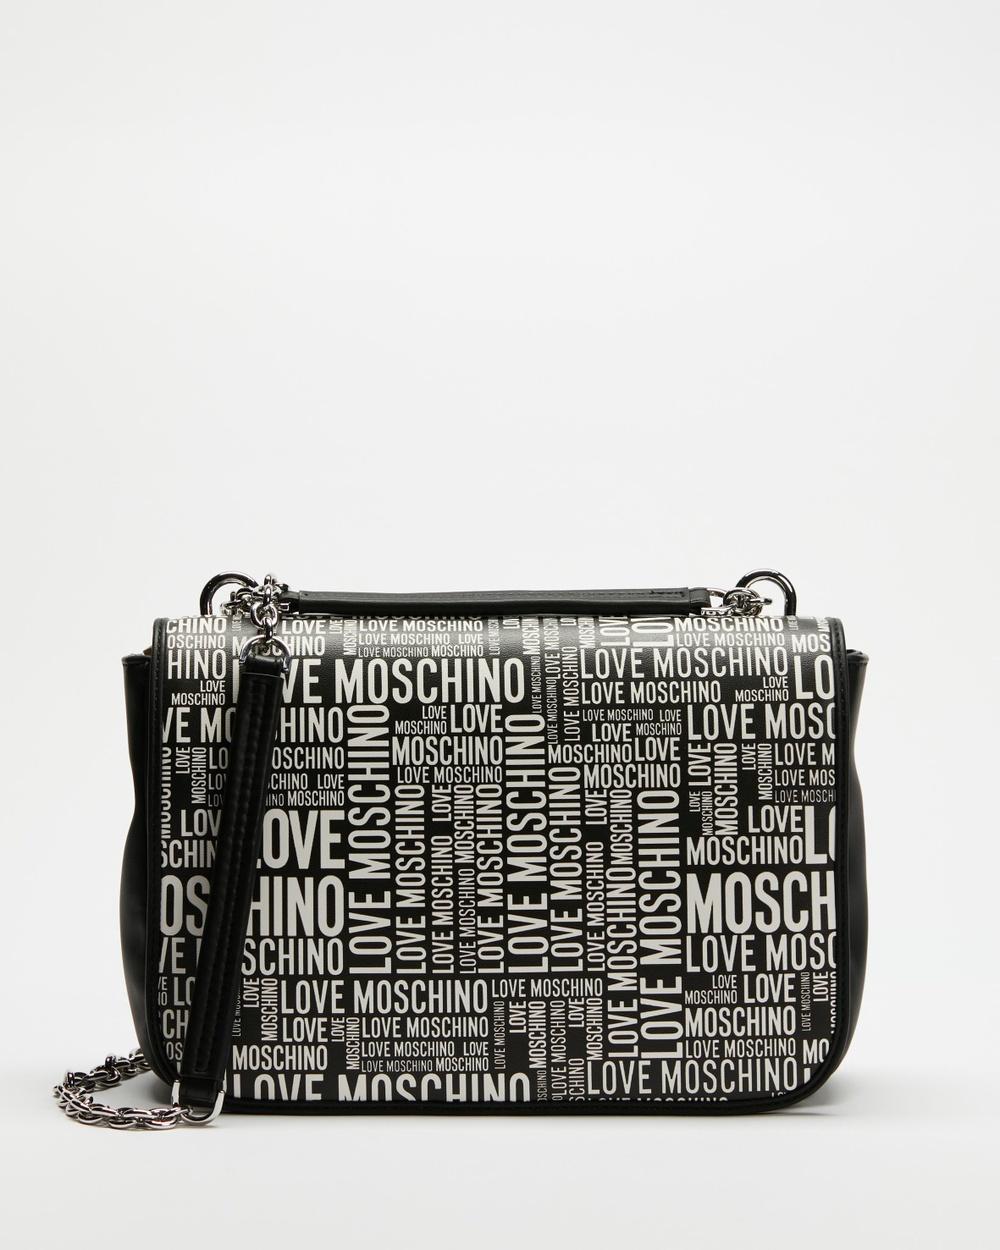 LOVE MOSCHINO Graffiti Shoulder Bag Handbags Fantasy Colour